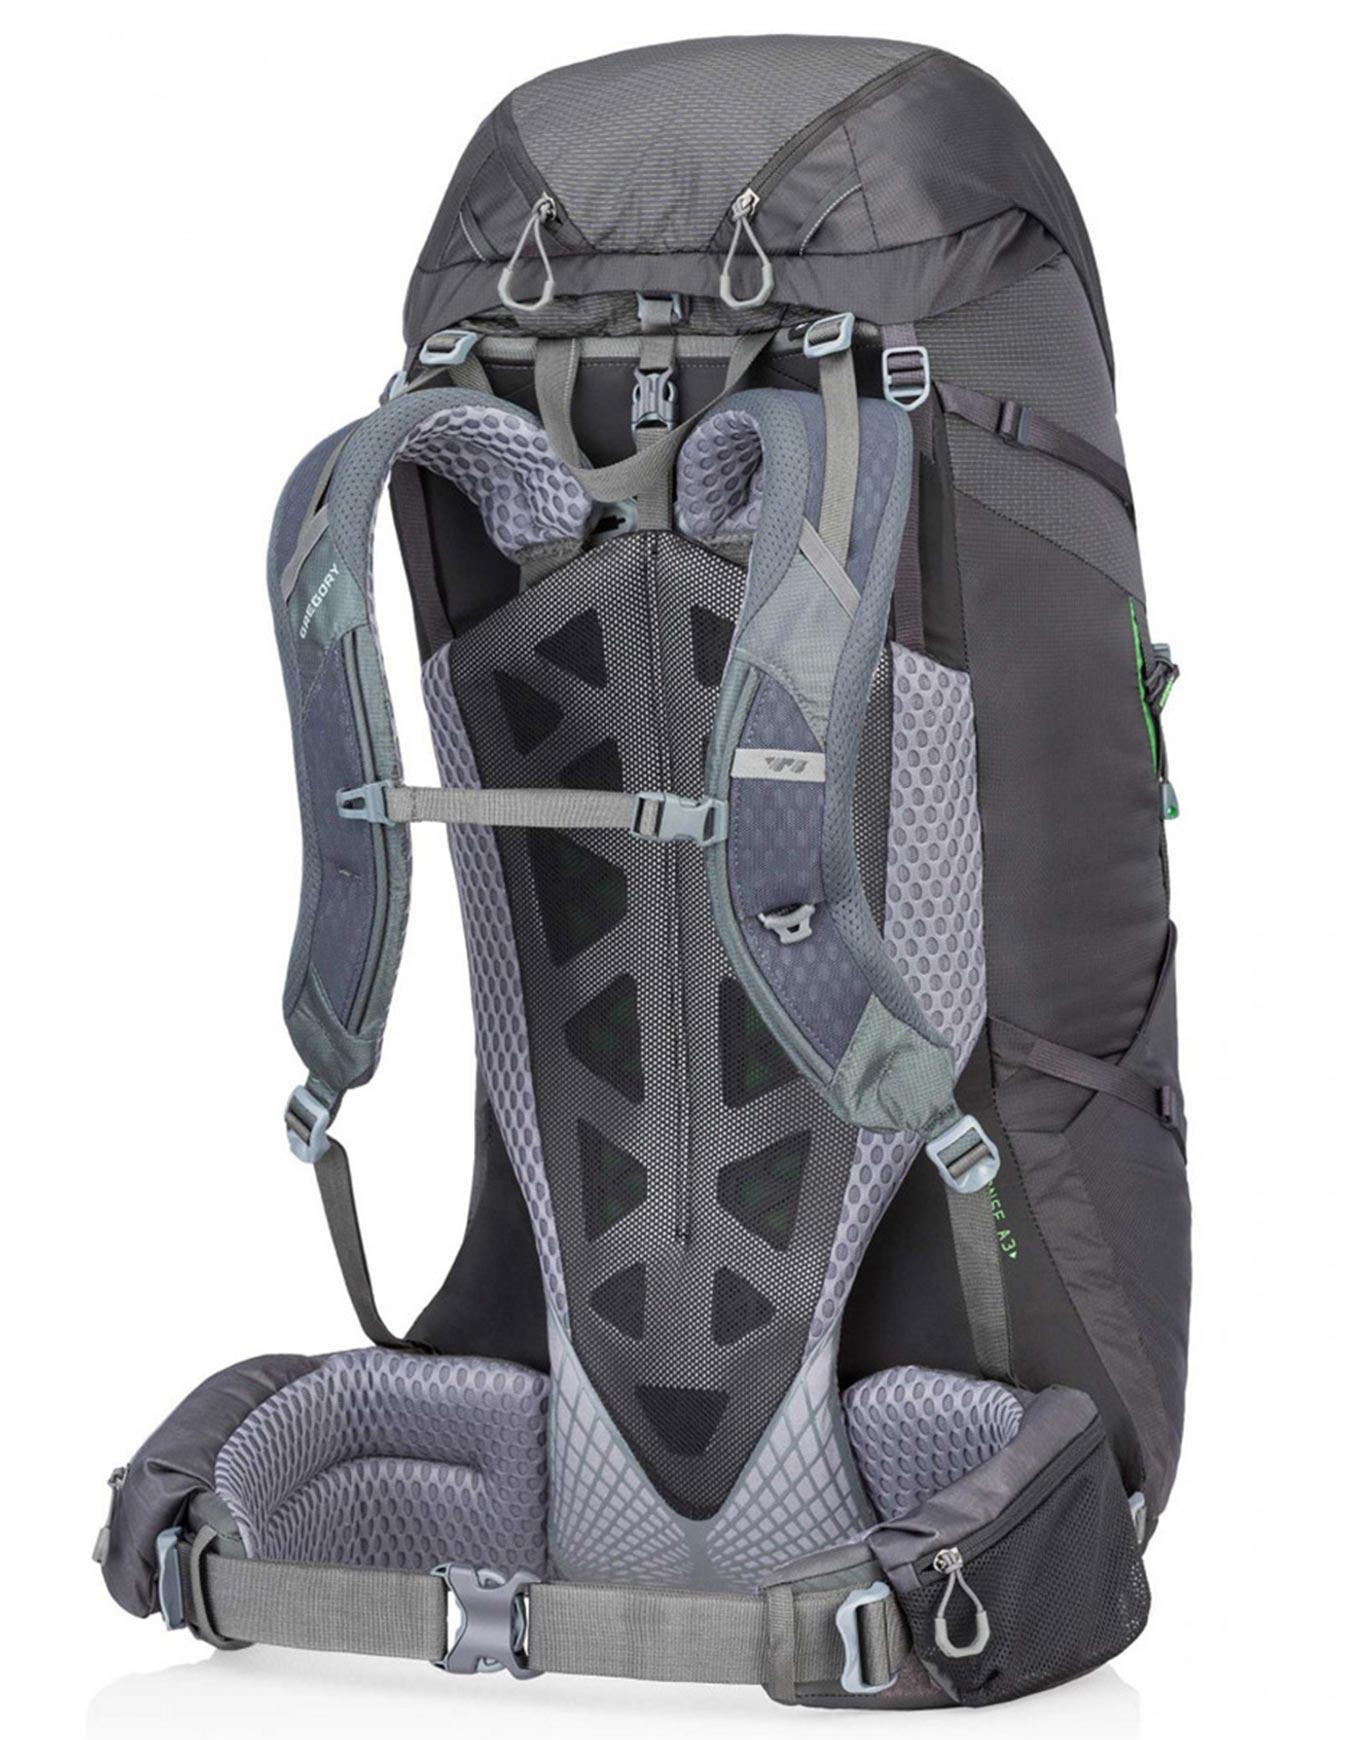 94ee43c2a1 Baltoro 65 Onyx Black Gregory : Sacs à dos trekking : Snowleader